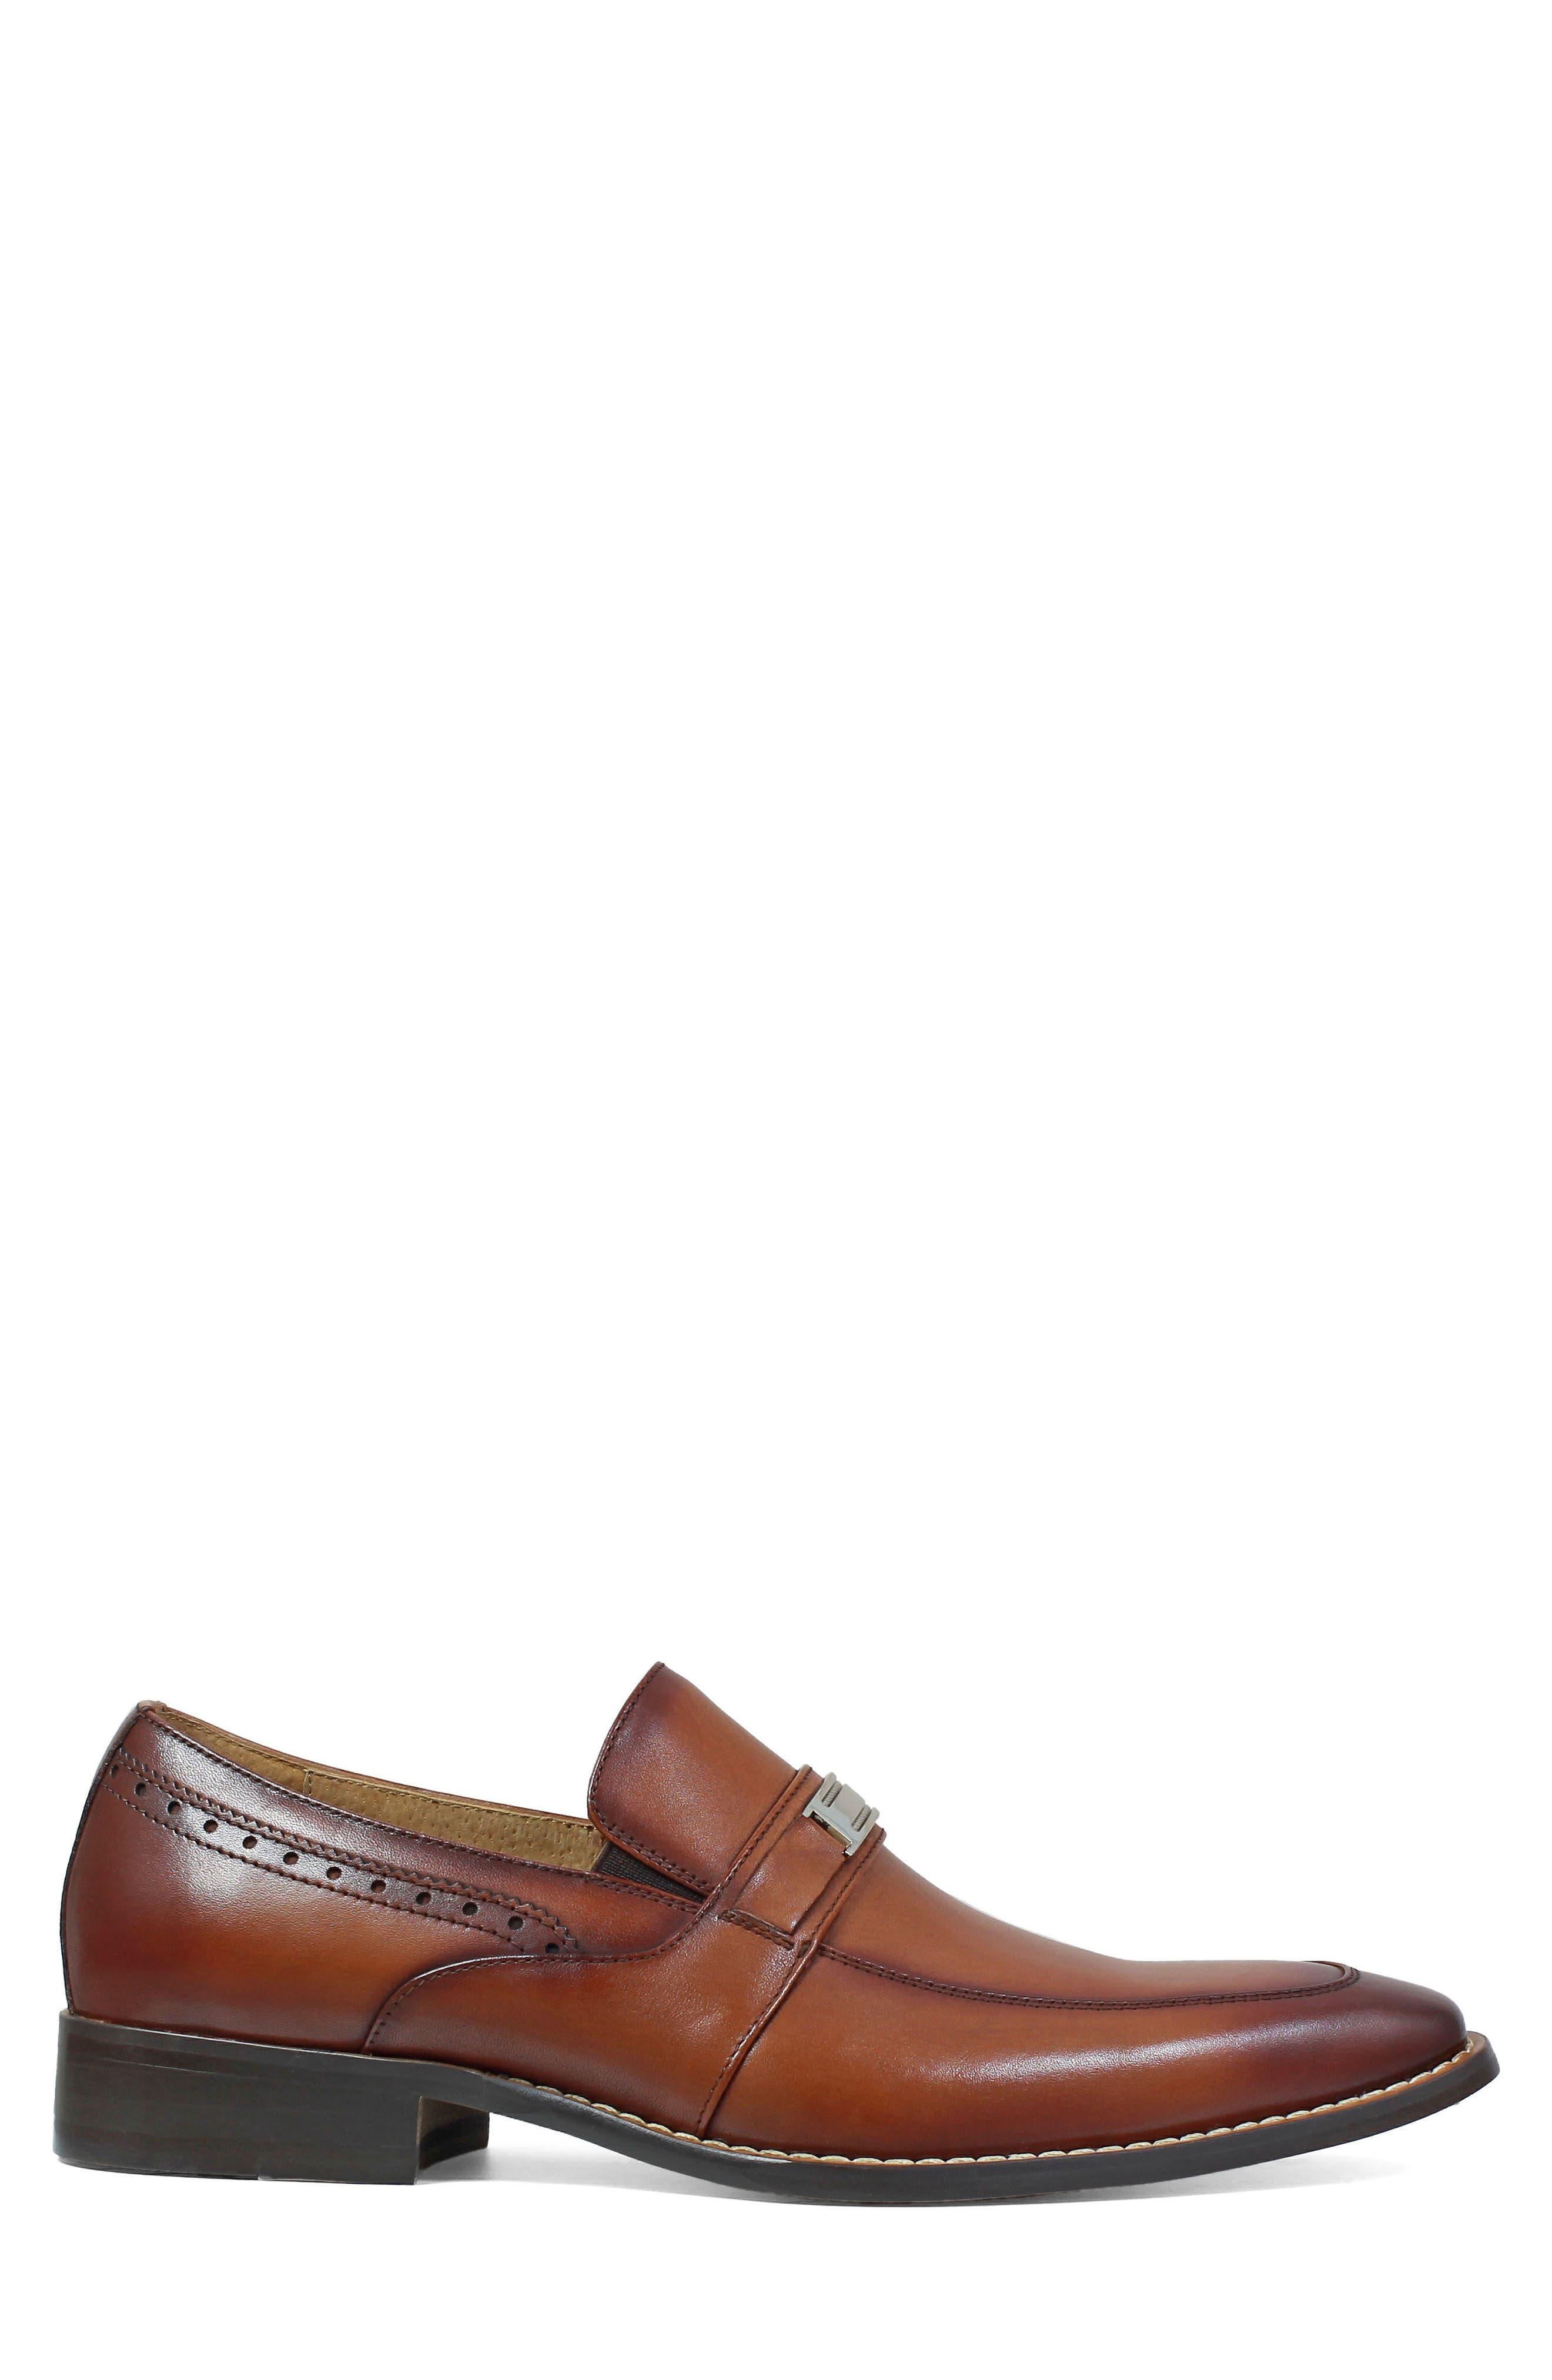 Shaw Bit Loafer,                             Alternate thumbnail 3, color,                             Cognac Leather